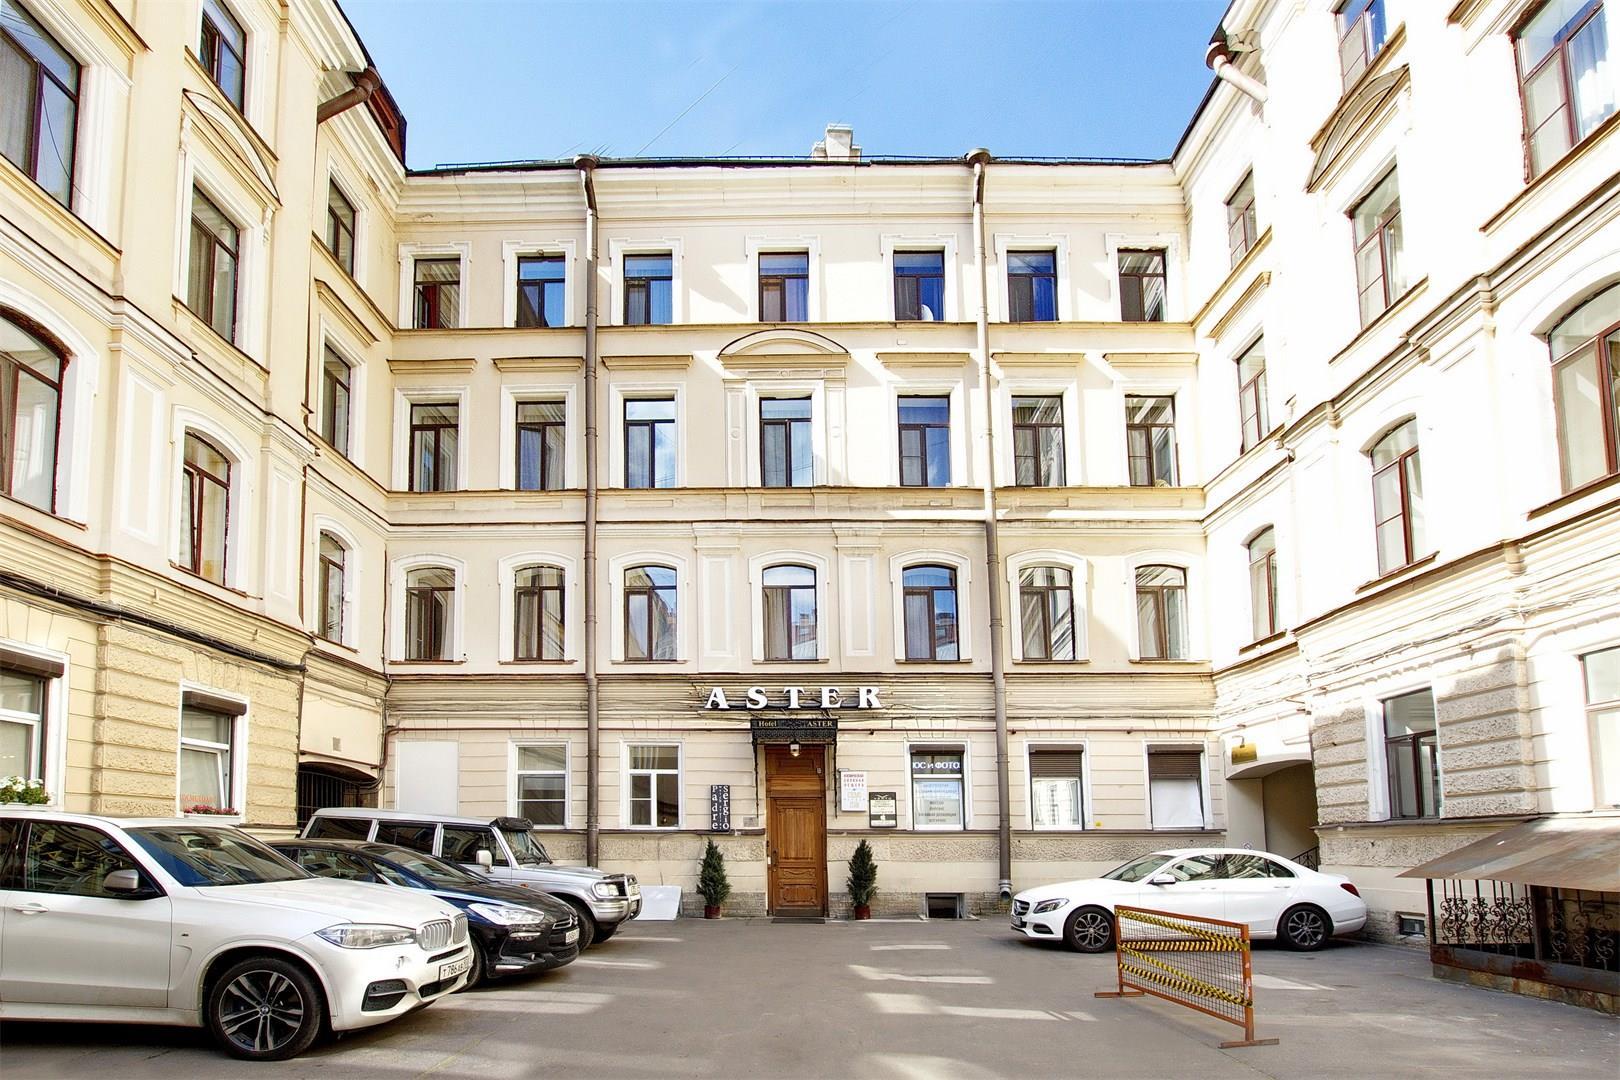 Nevsky_Aster_Fassade.jpg